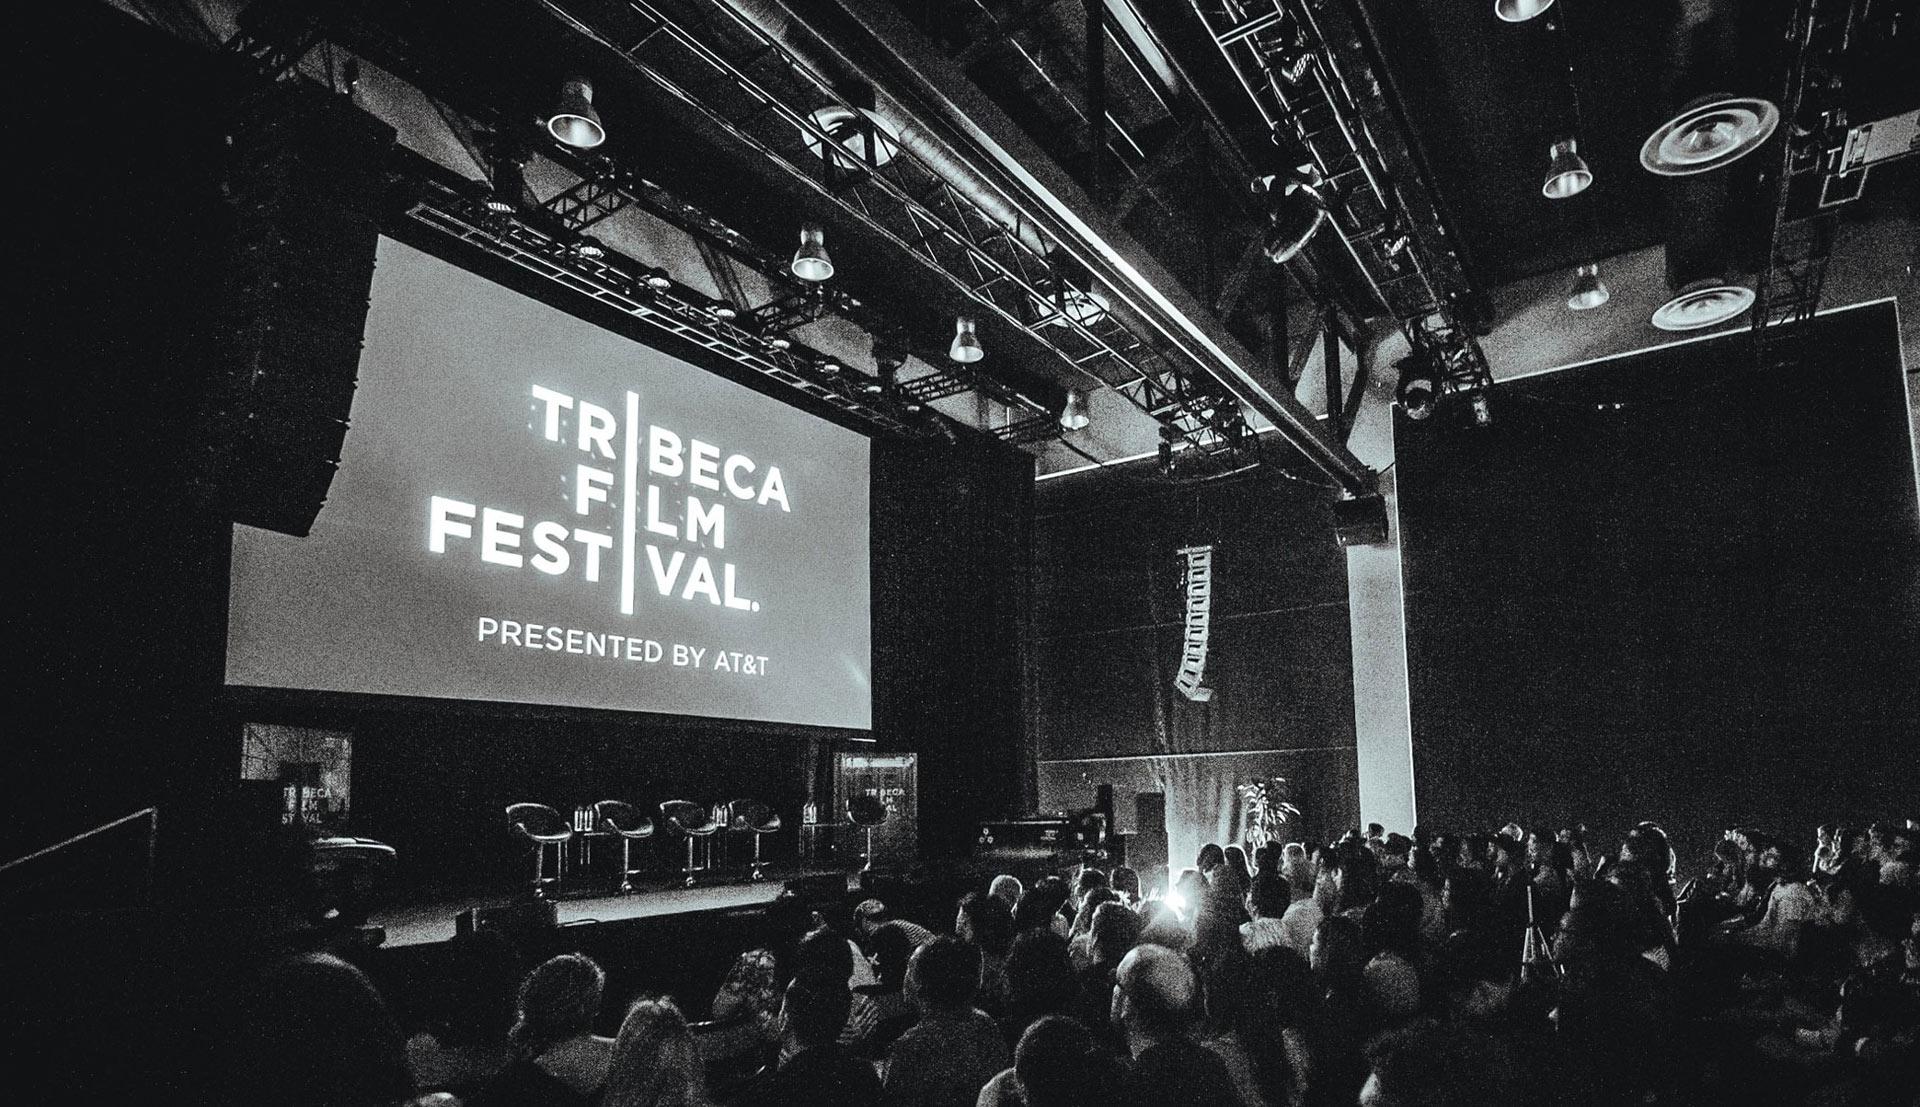 tibreca-film-festival.jpg